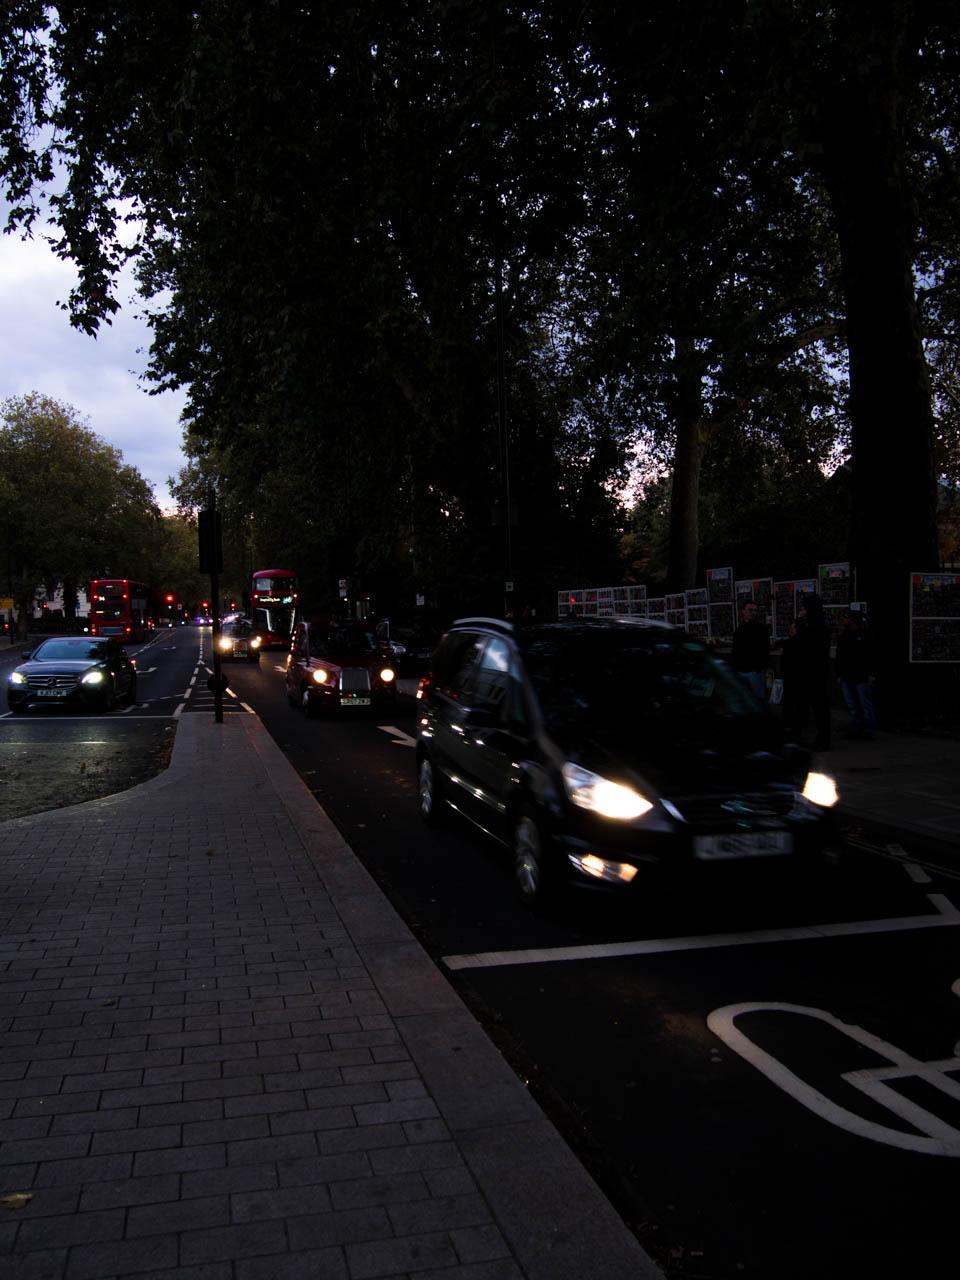 london-city-lights-night-time